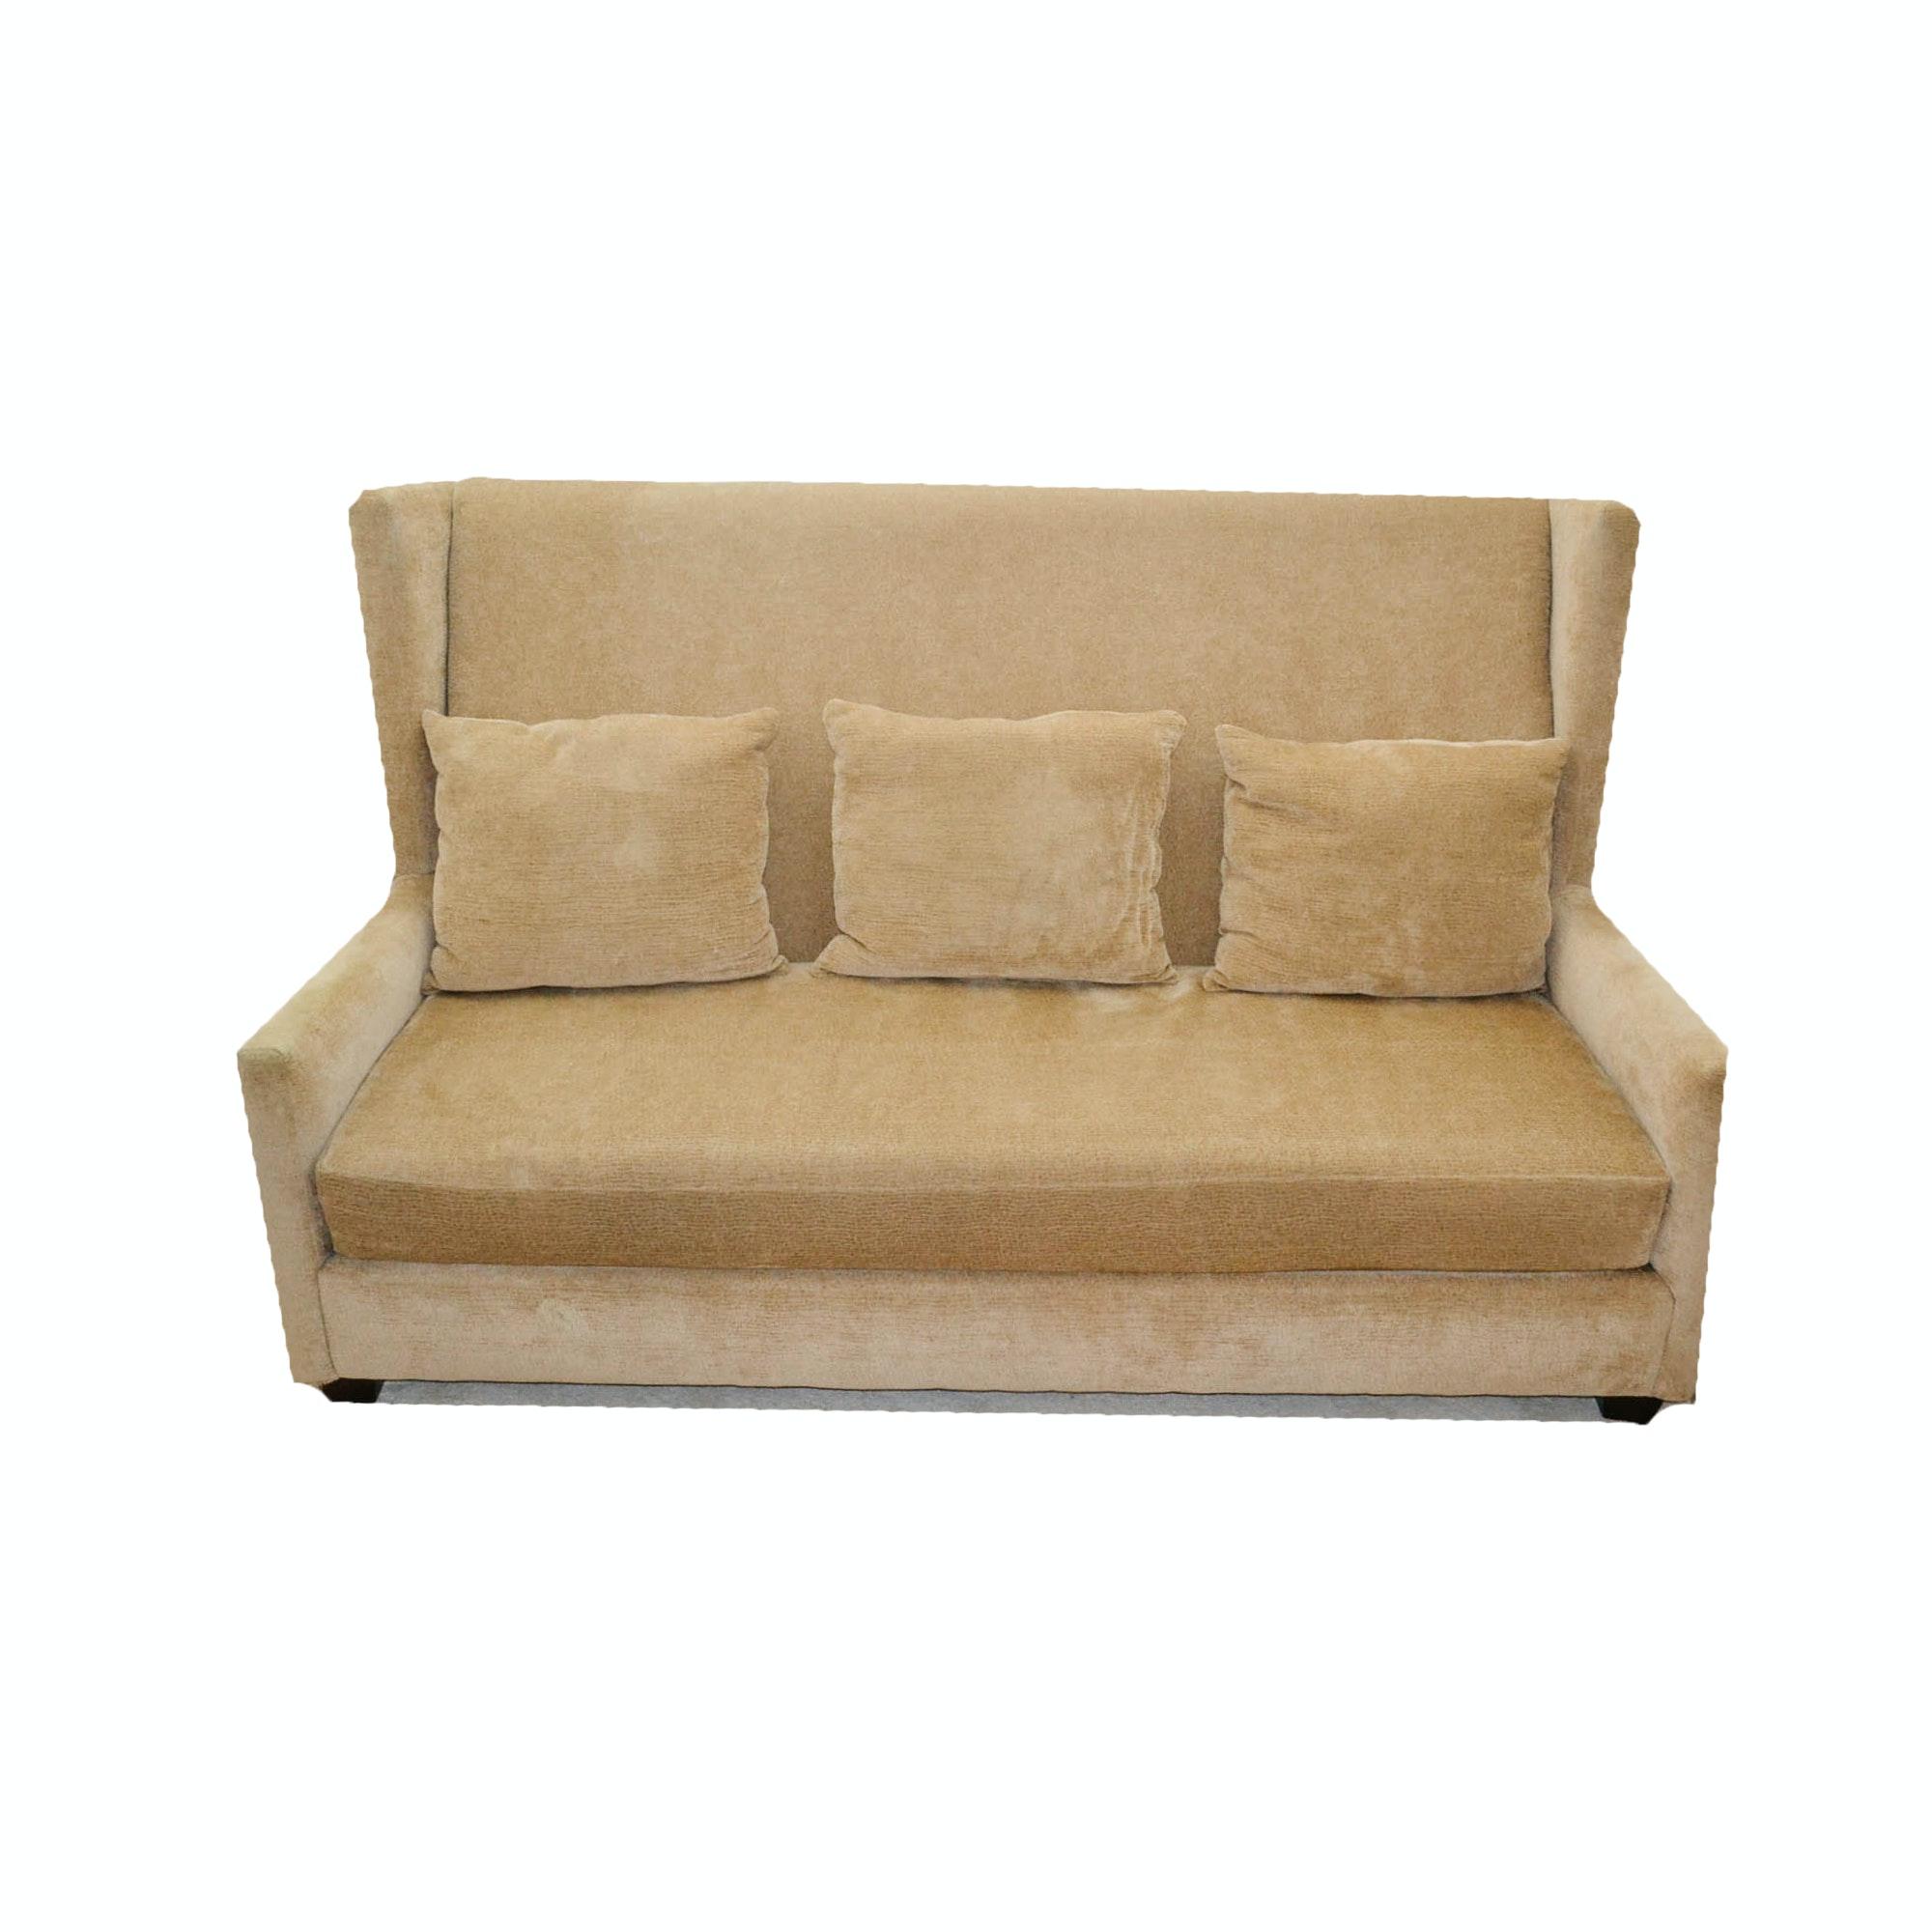 High Back Alcove Sofa By Hillcraft Furniture Company